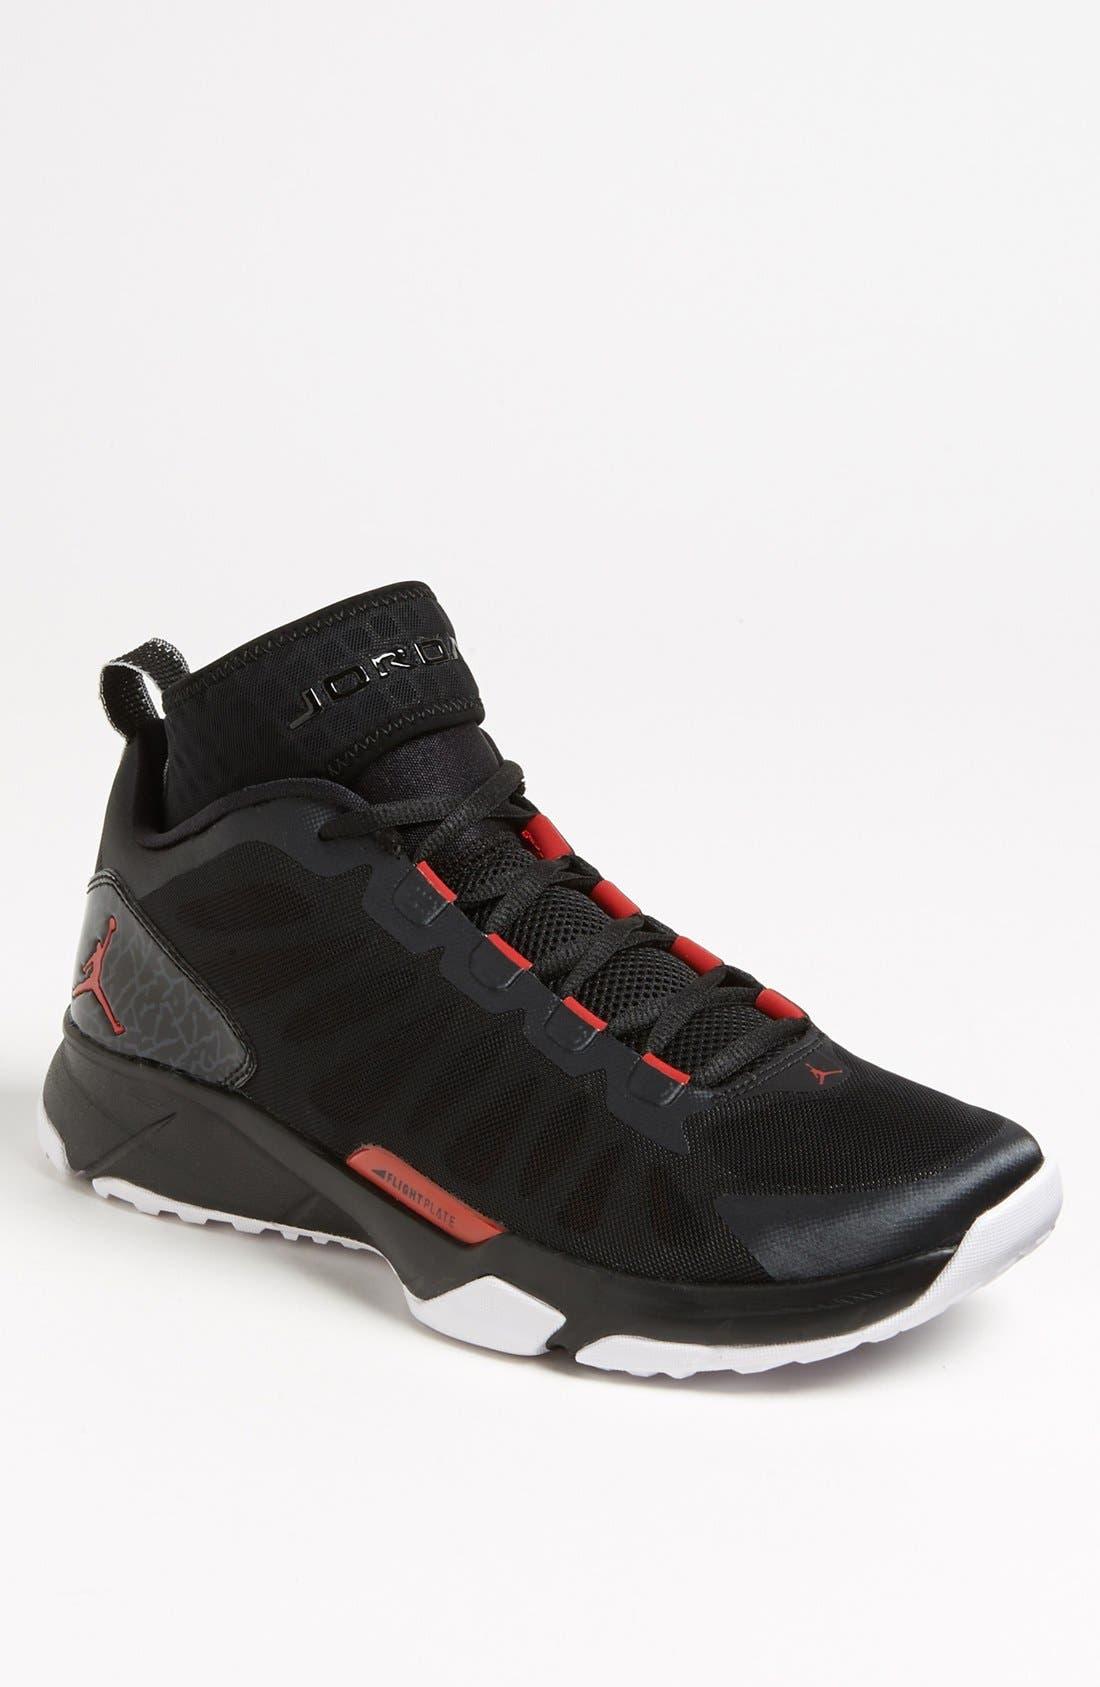 Alternate Image 1 Selected - Nike 'Jordan Dominate Pro' Training Shoe (Men)